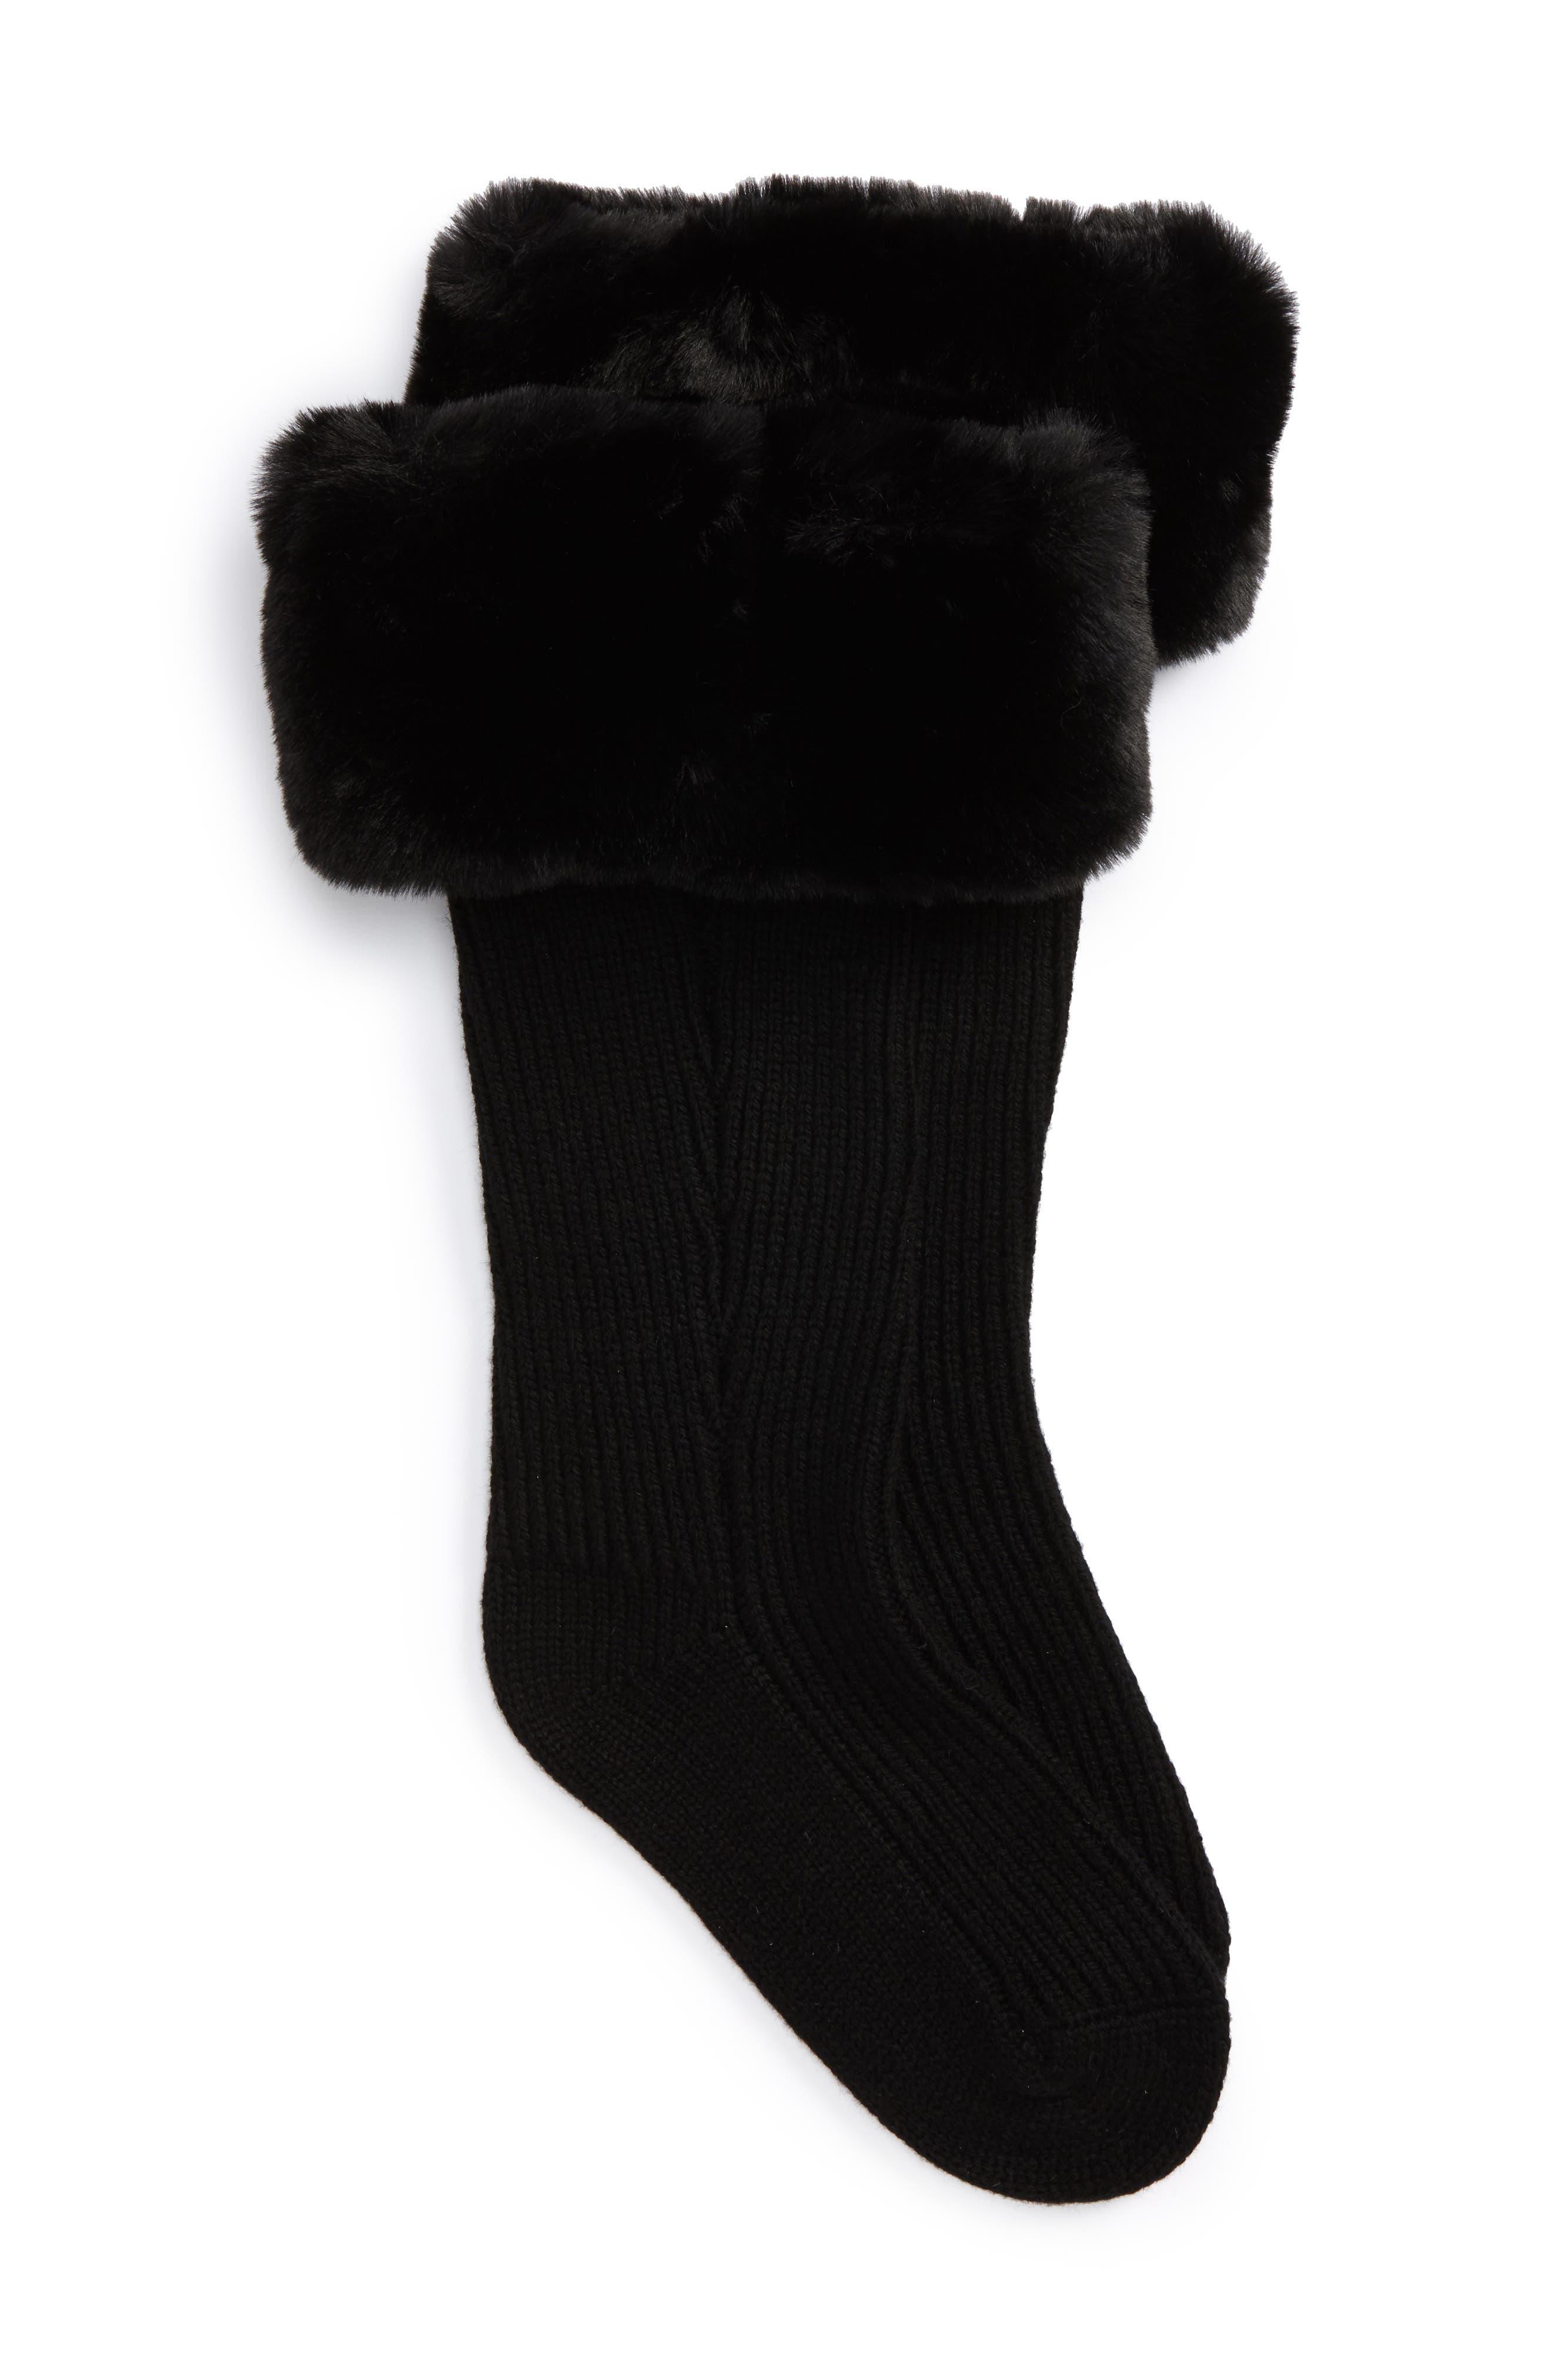 UGGpure<sup>™</sup> Tall Rain Boot Sock,                             Main thumbnail 1, color,                             BLACK WOOL